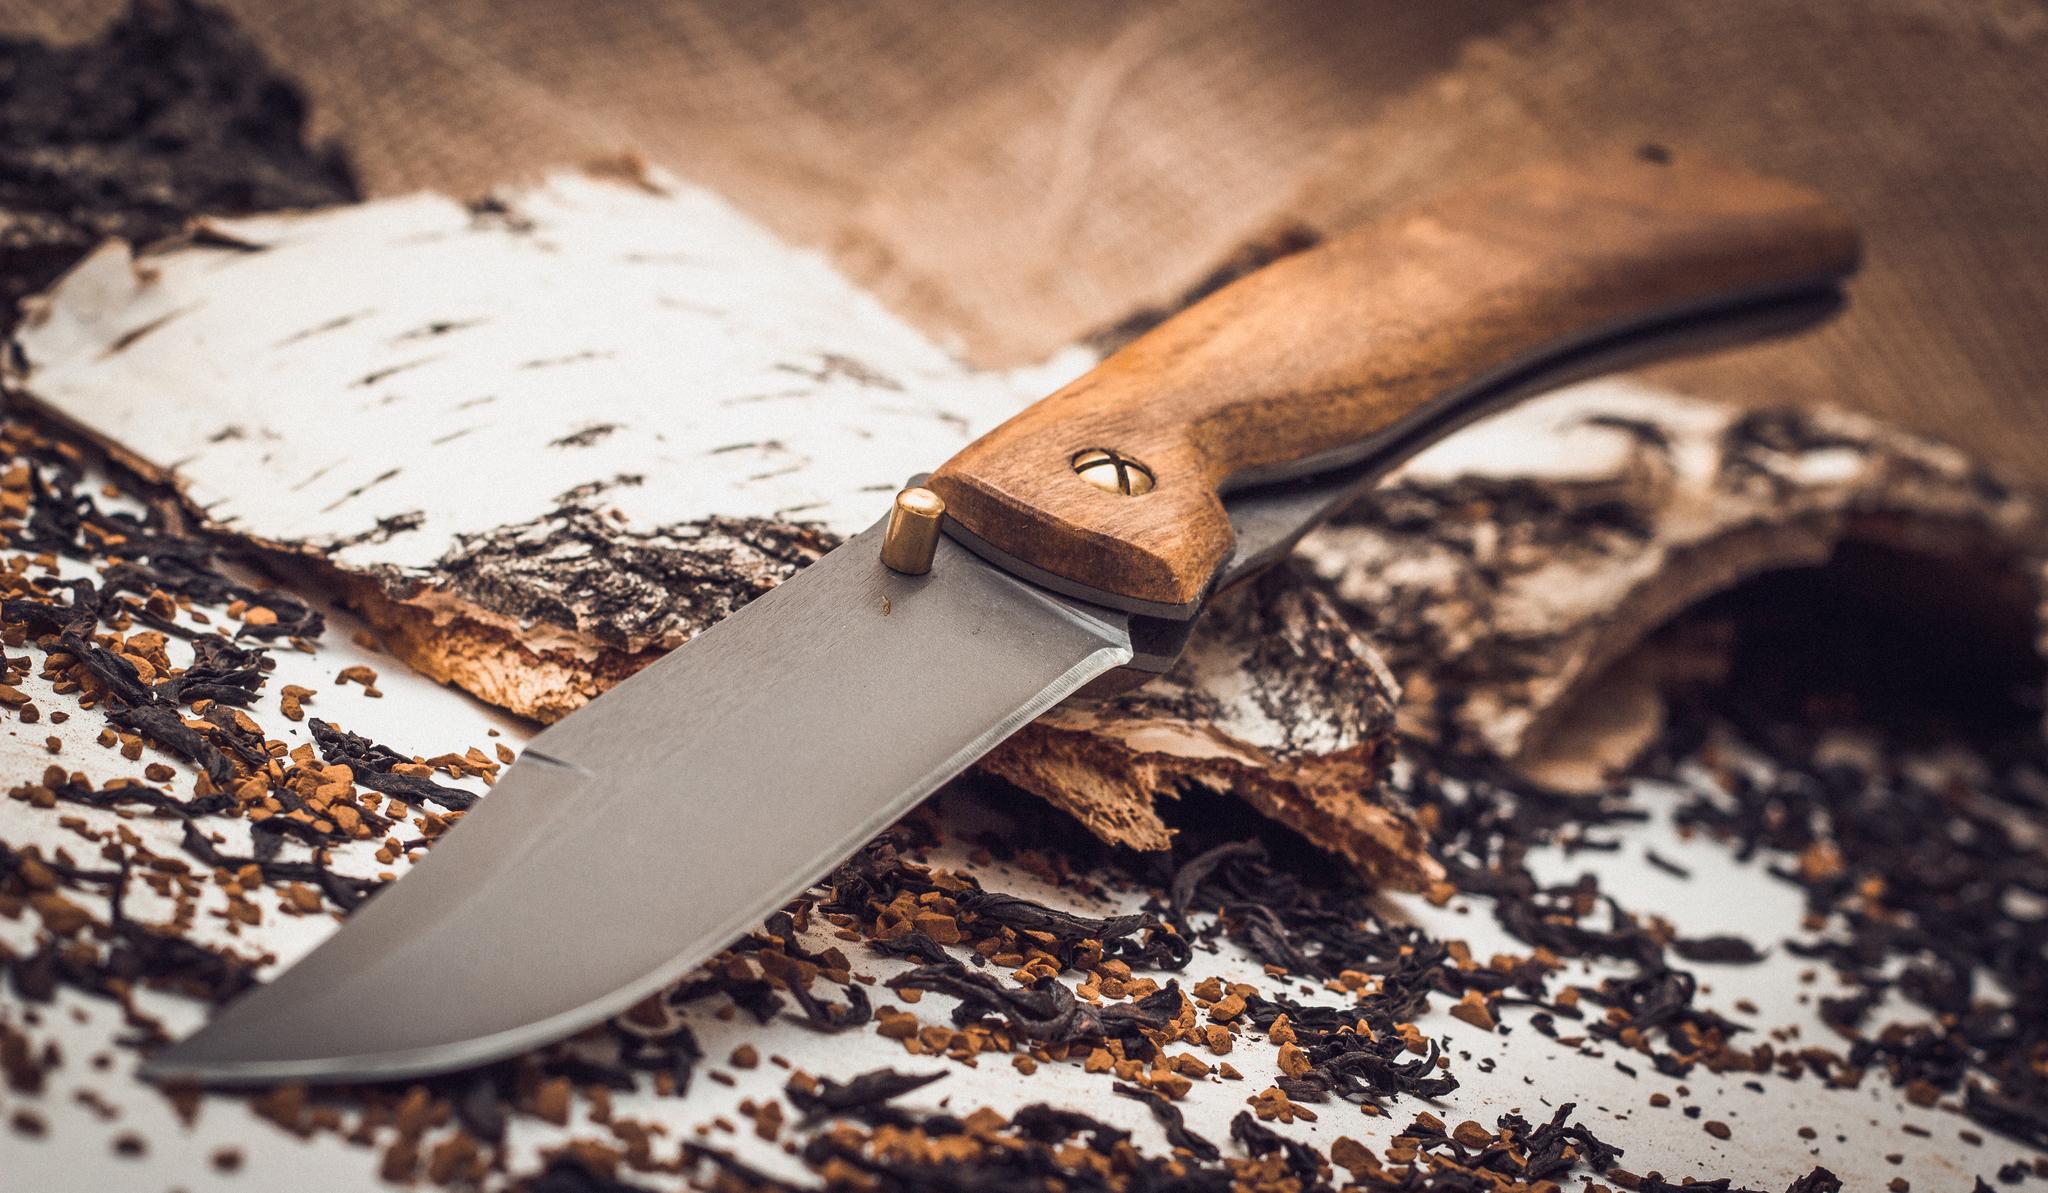 Фото 2 - Складной нож Храбрец, сталь 95х18, орех от Марычев